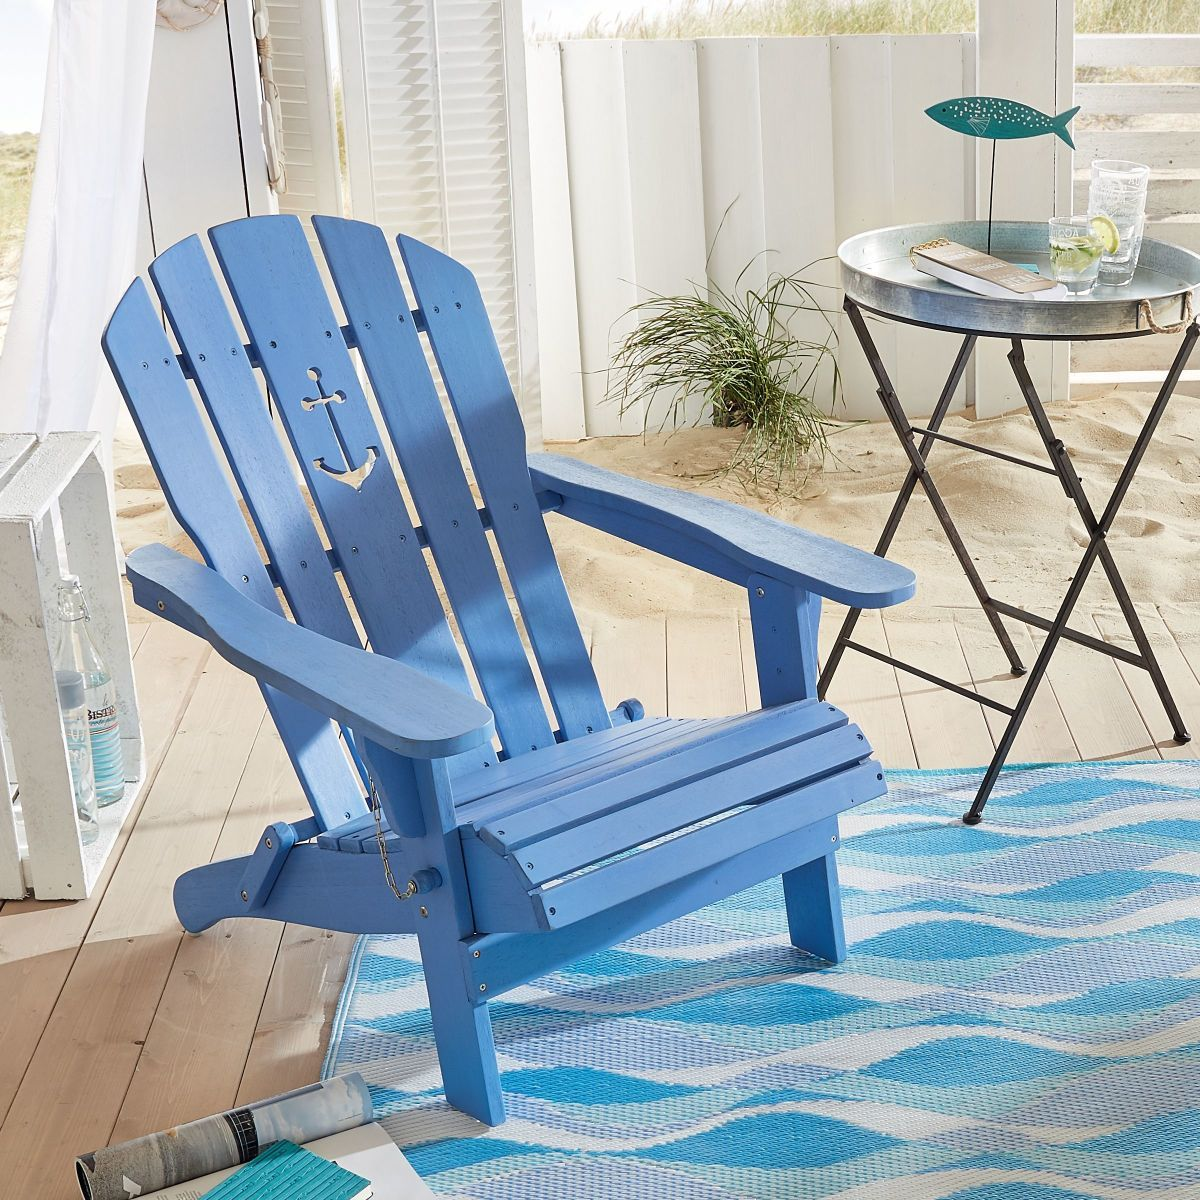 Gartenstuhl Anker, Adirondack Chair Klappbar, Maritimer Look, Holz Jetzt  Bestellen Unter: Https